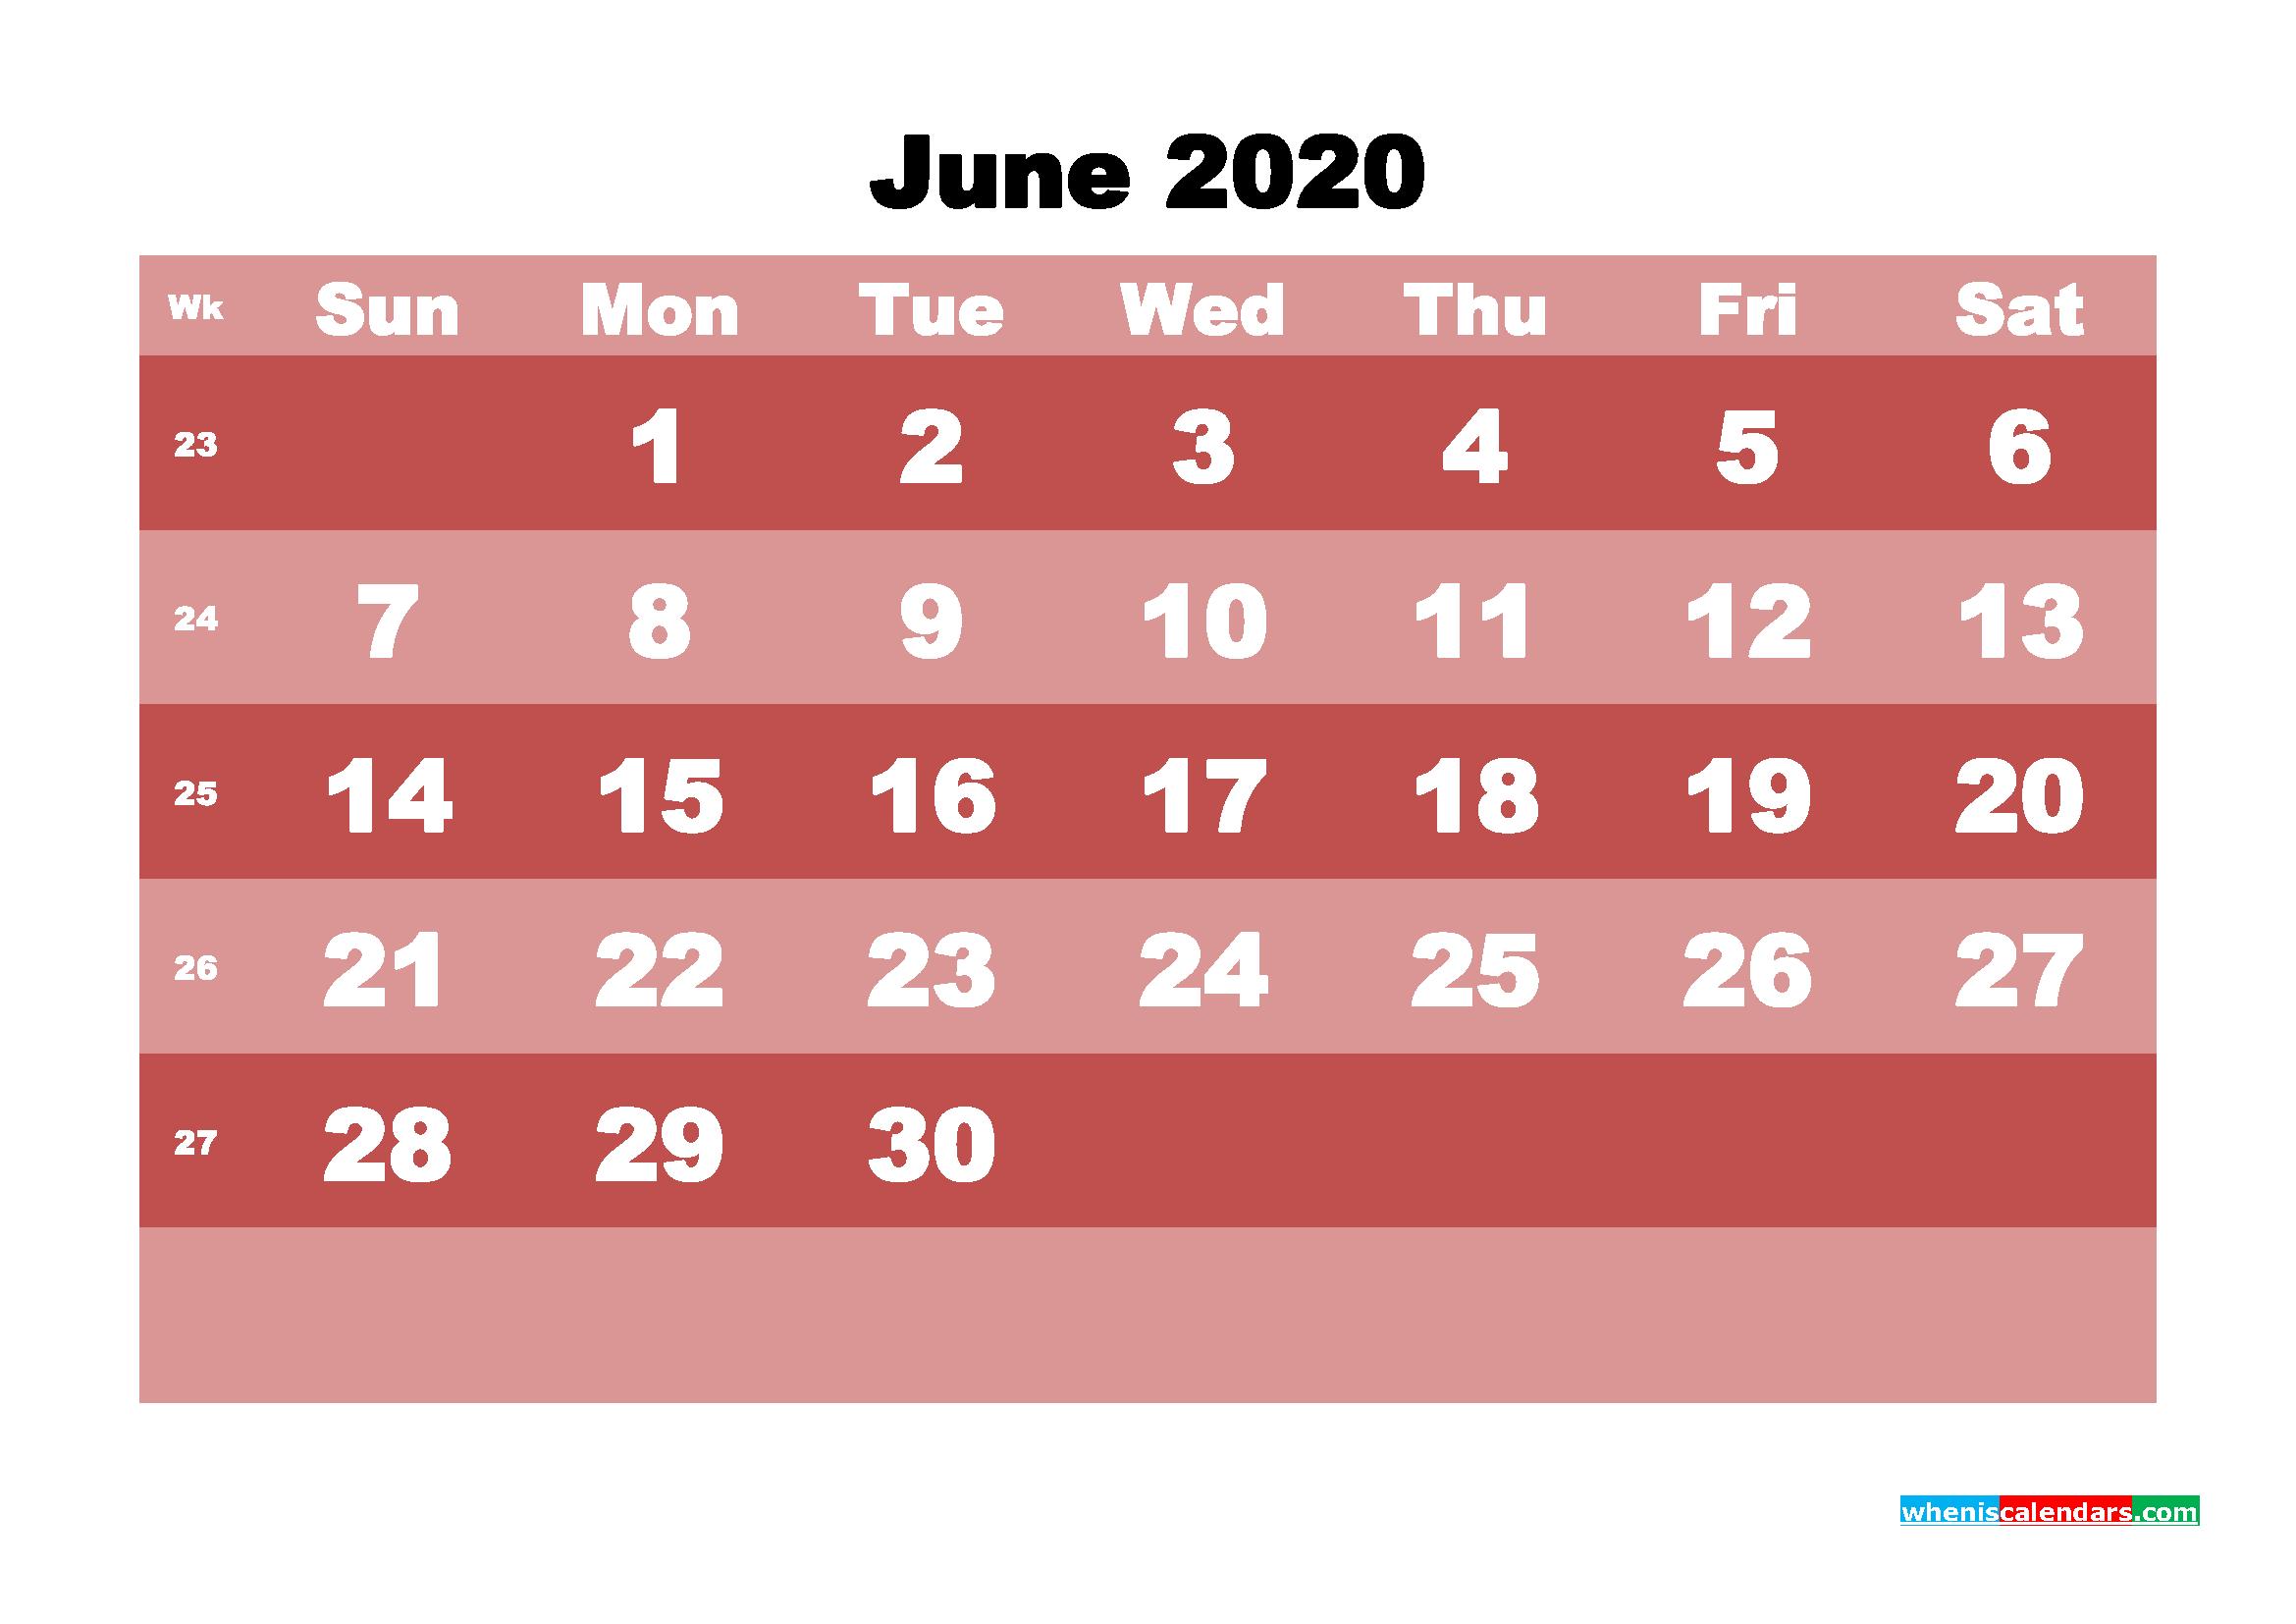 Free Printable June 2020 Calendar - No.m20b534